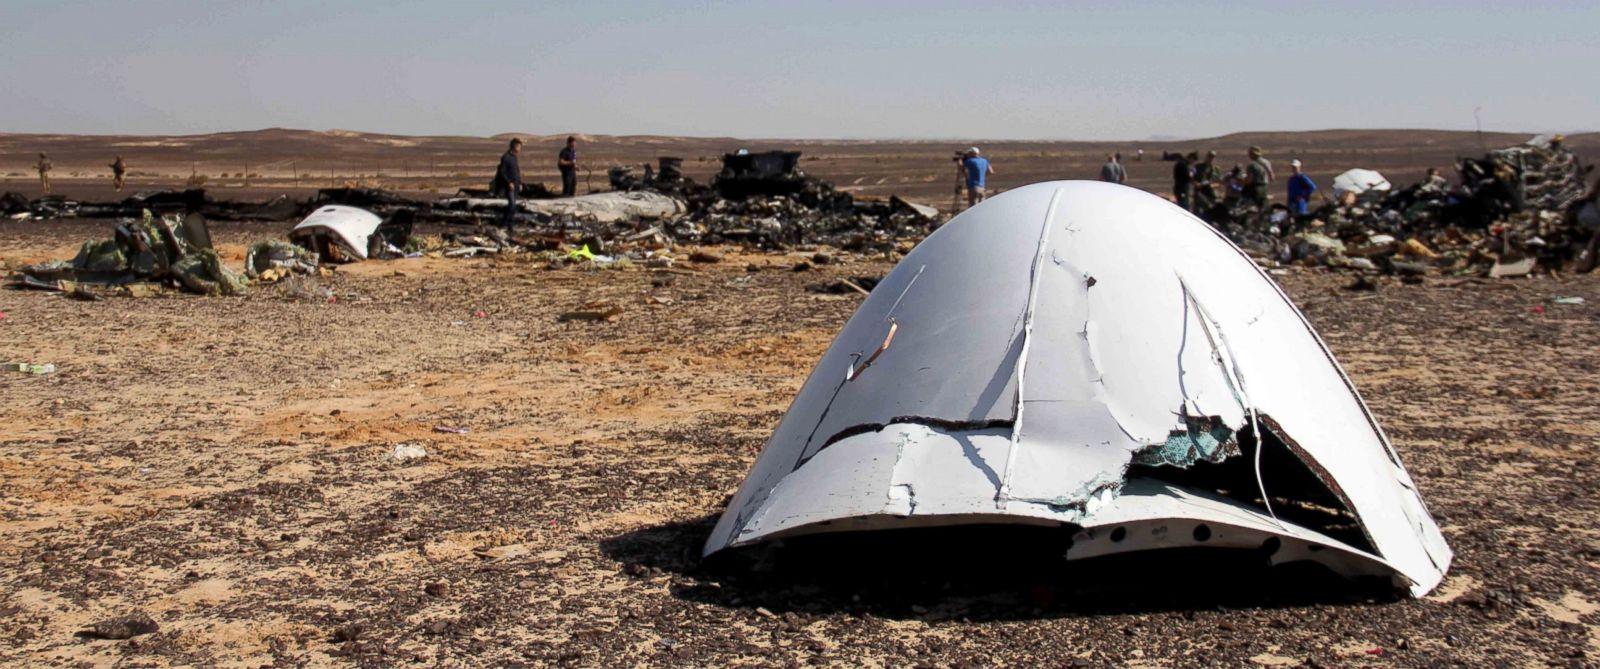 PHOTO: Russian Plane Crash in Egypt